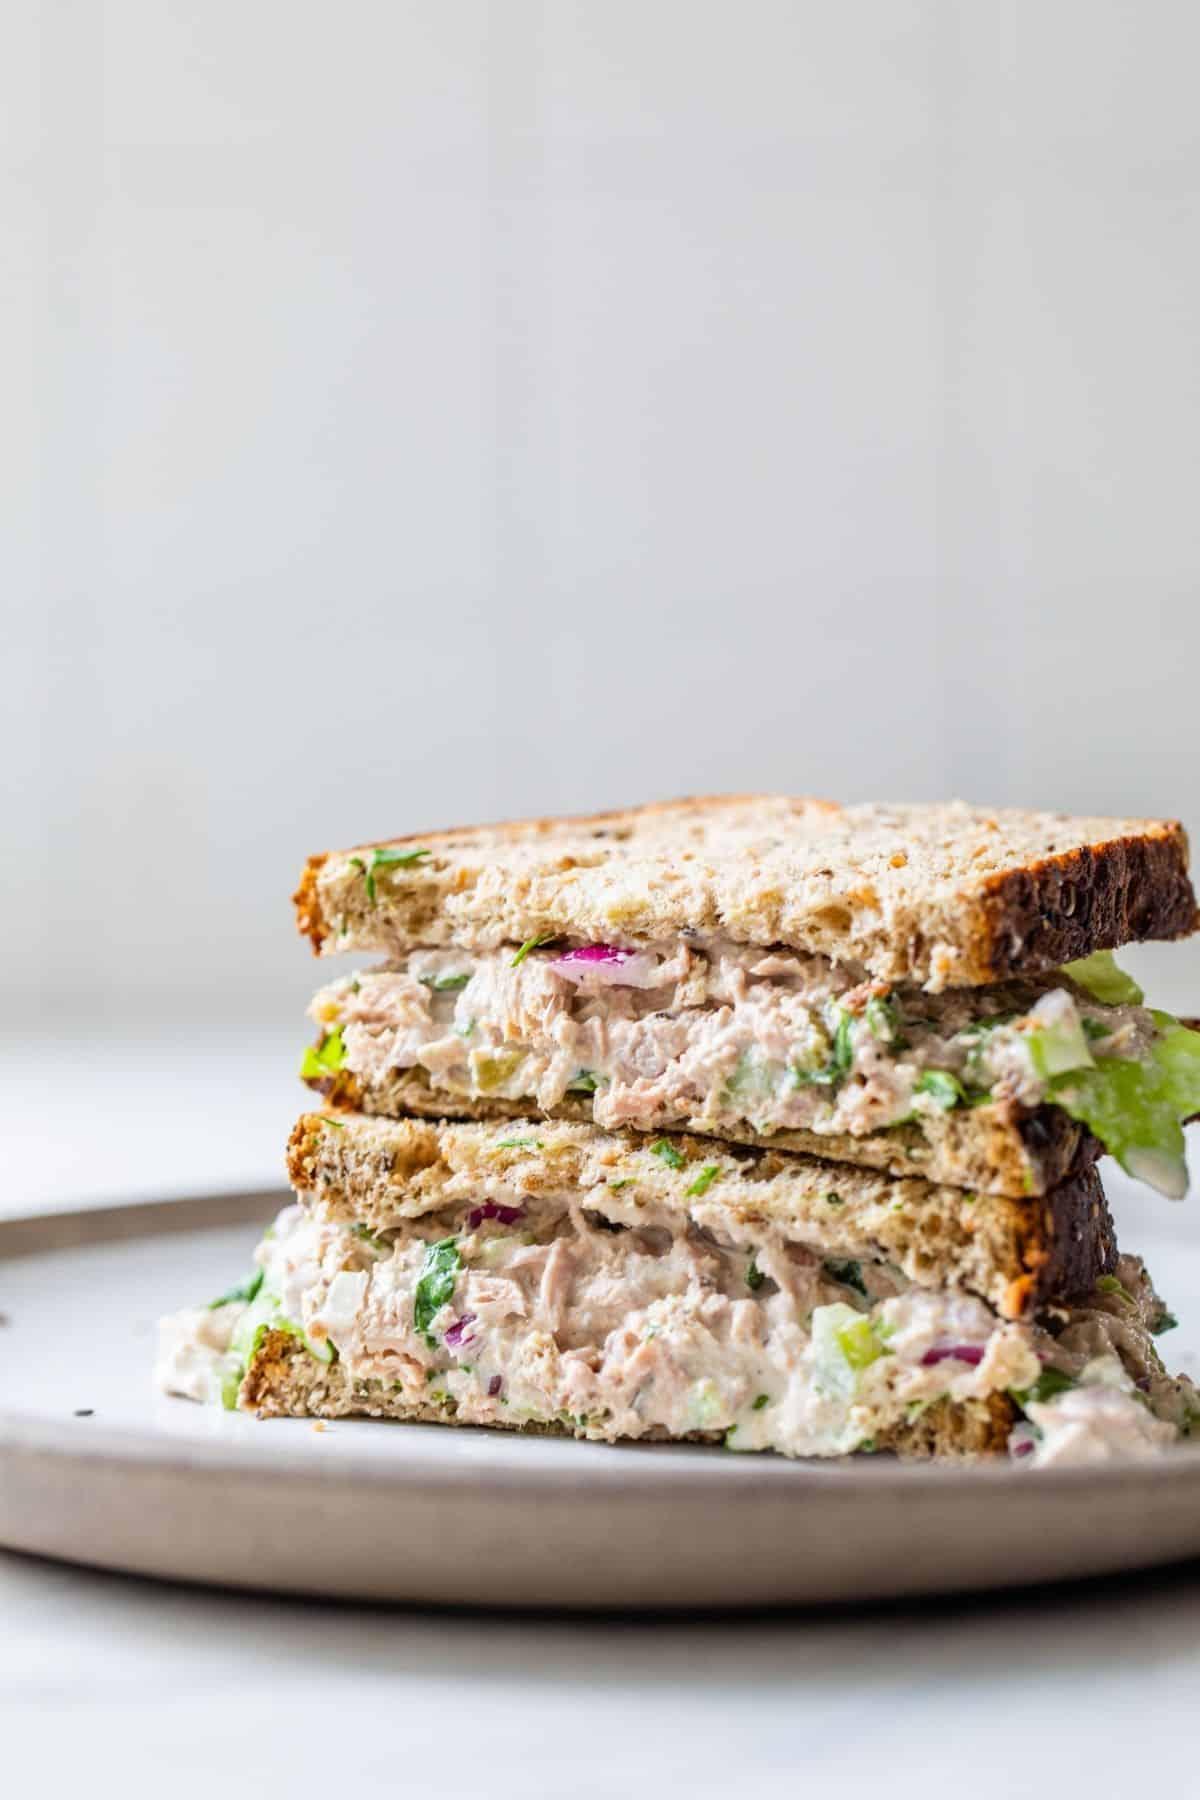 tuna salad sandwich served on a small white plate